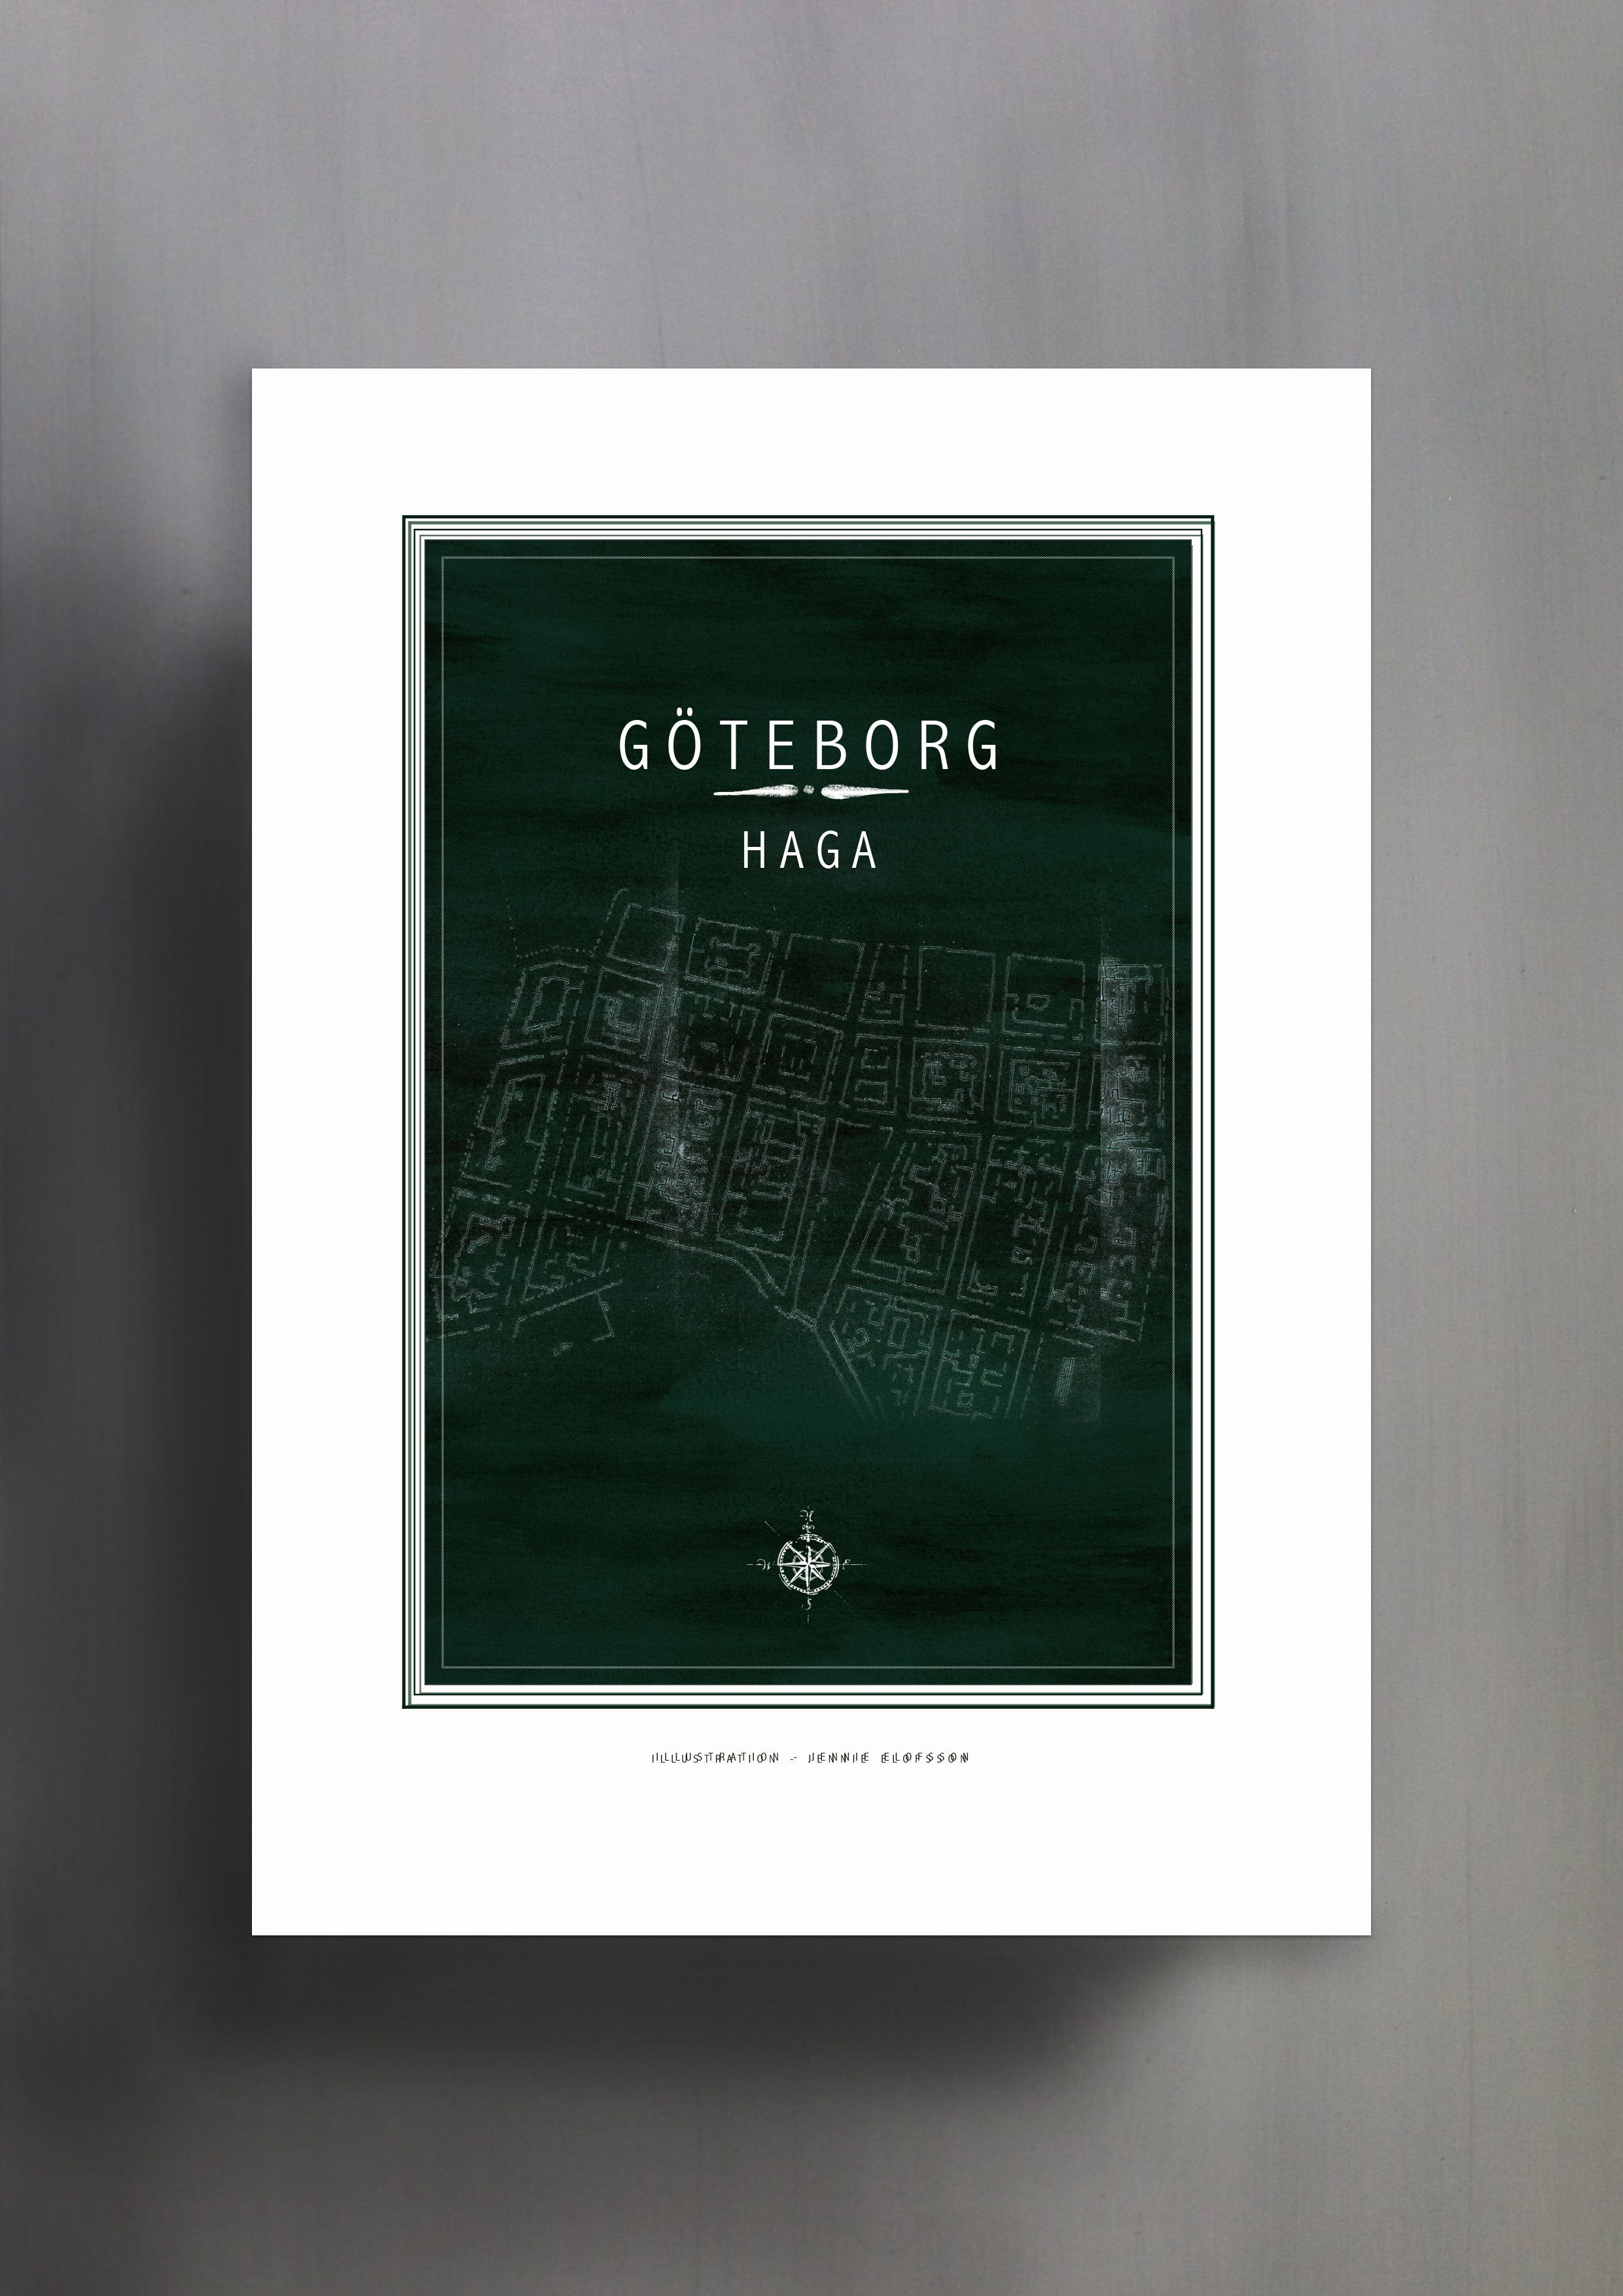 karta haga göteborg HAGA | GÖTEB| GRÖN | © Line of Art by Jennie Elofsson  karta haga göteborg